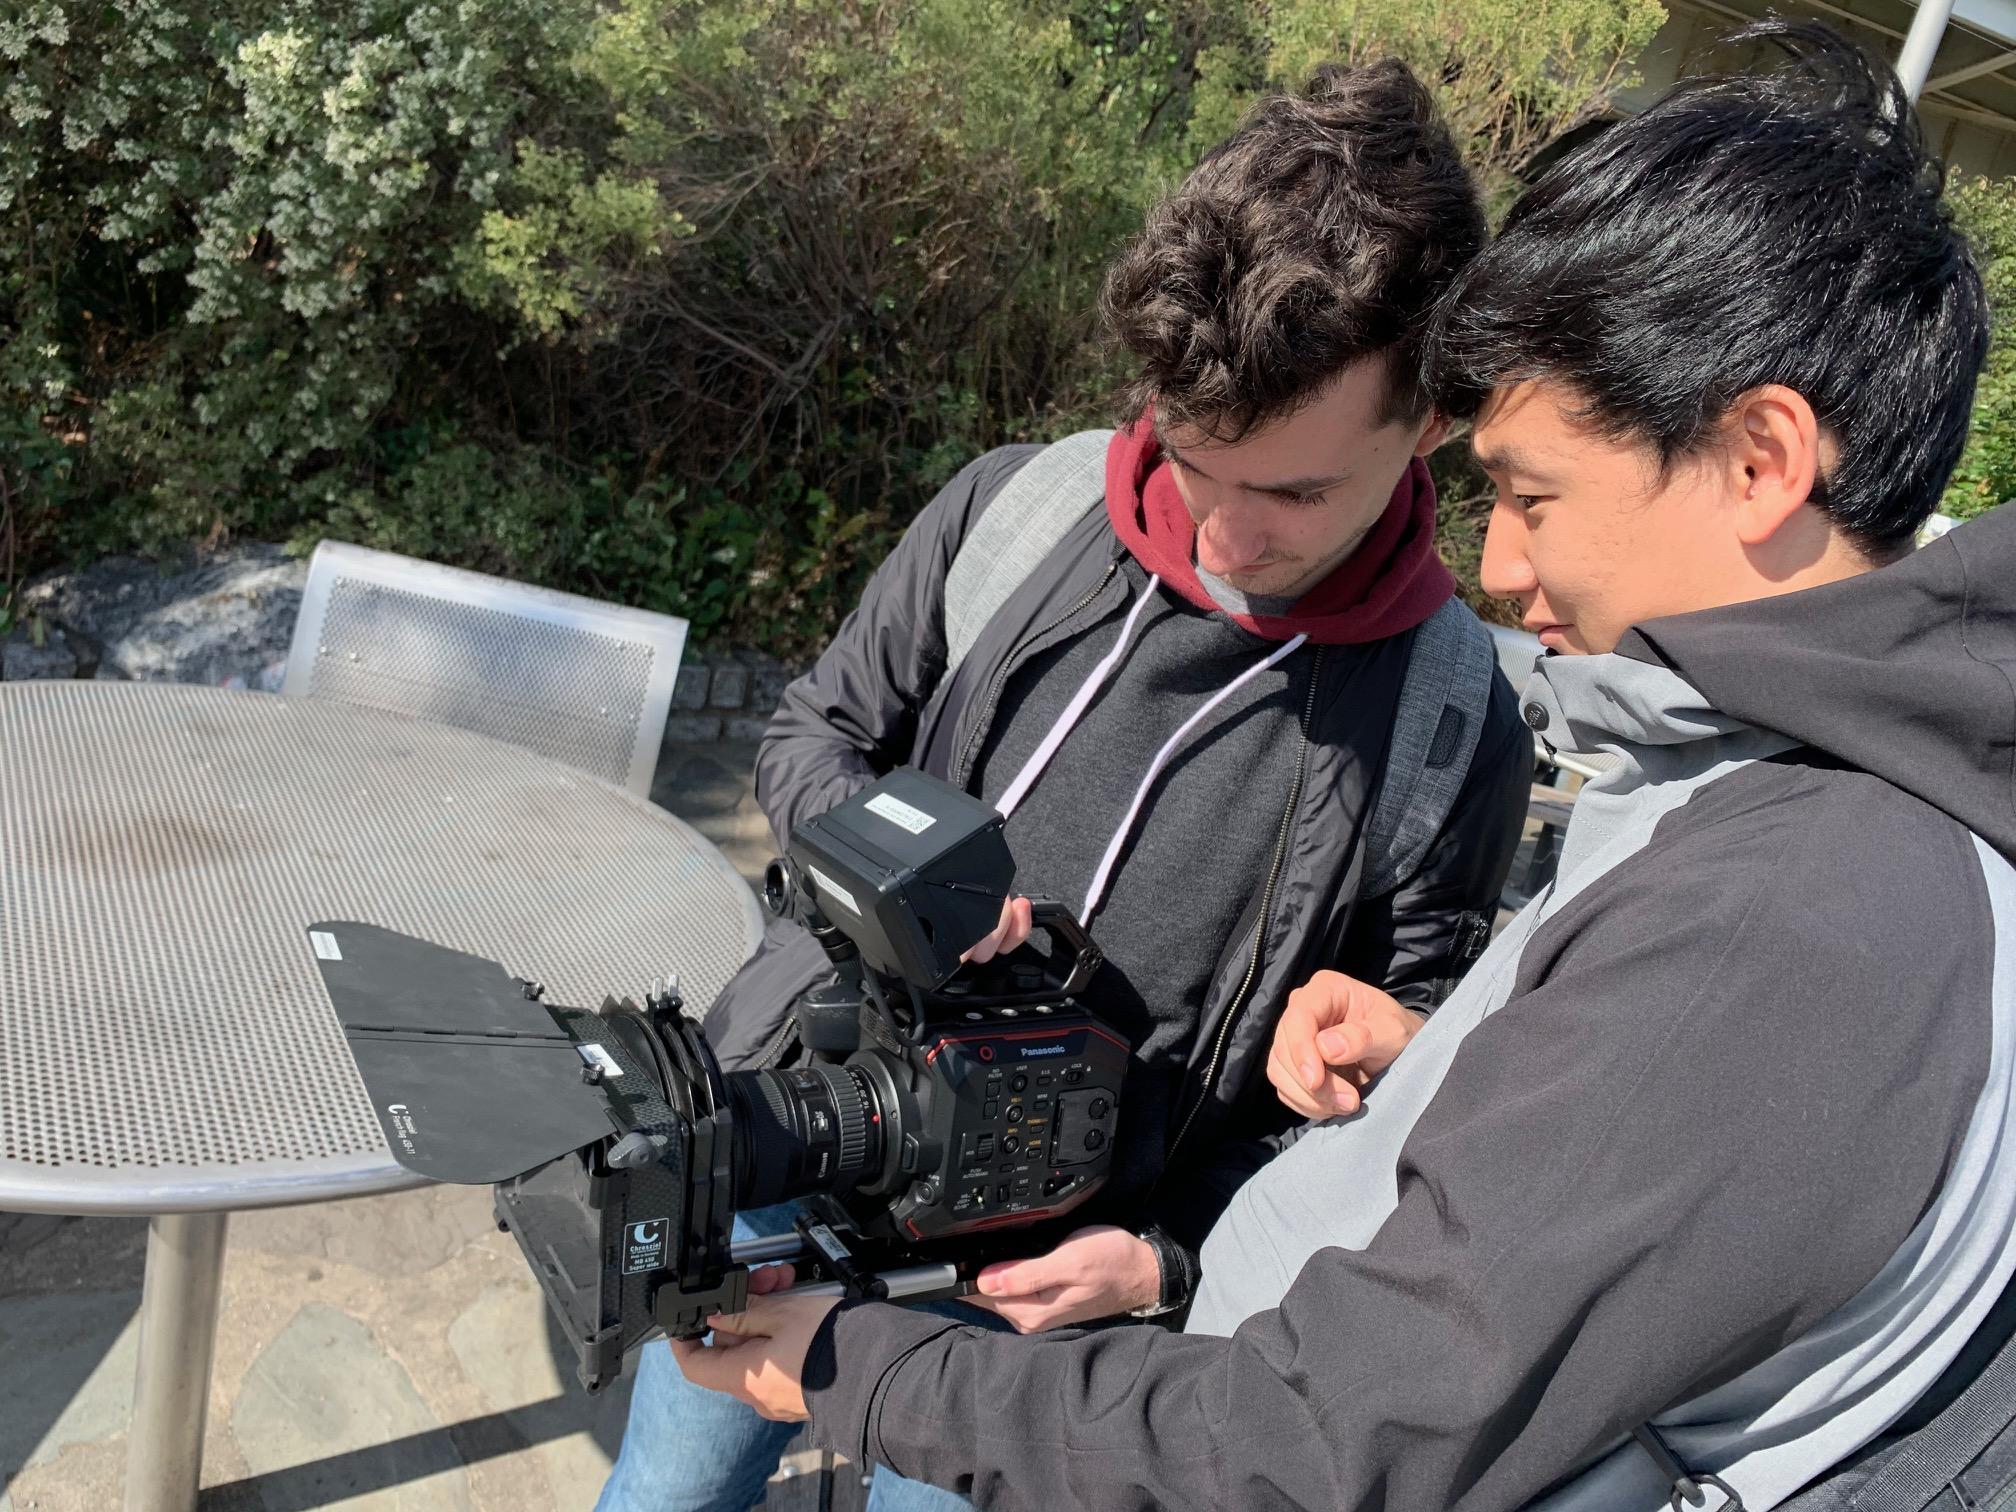 New York City's School of Visual Arts Buys 30 EVA1 5.7K Cameras 2